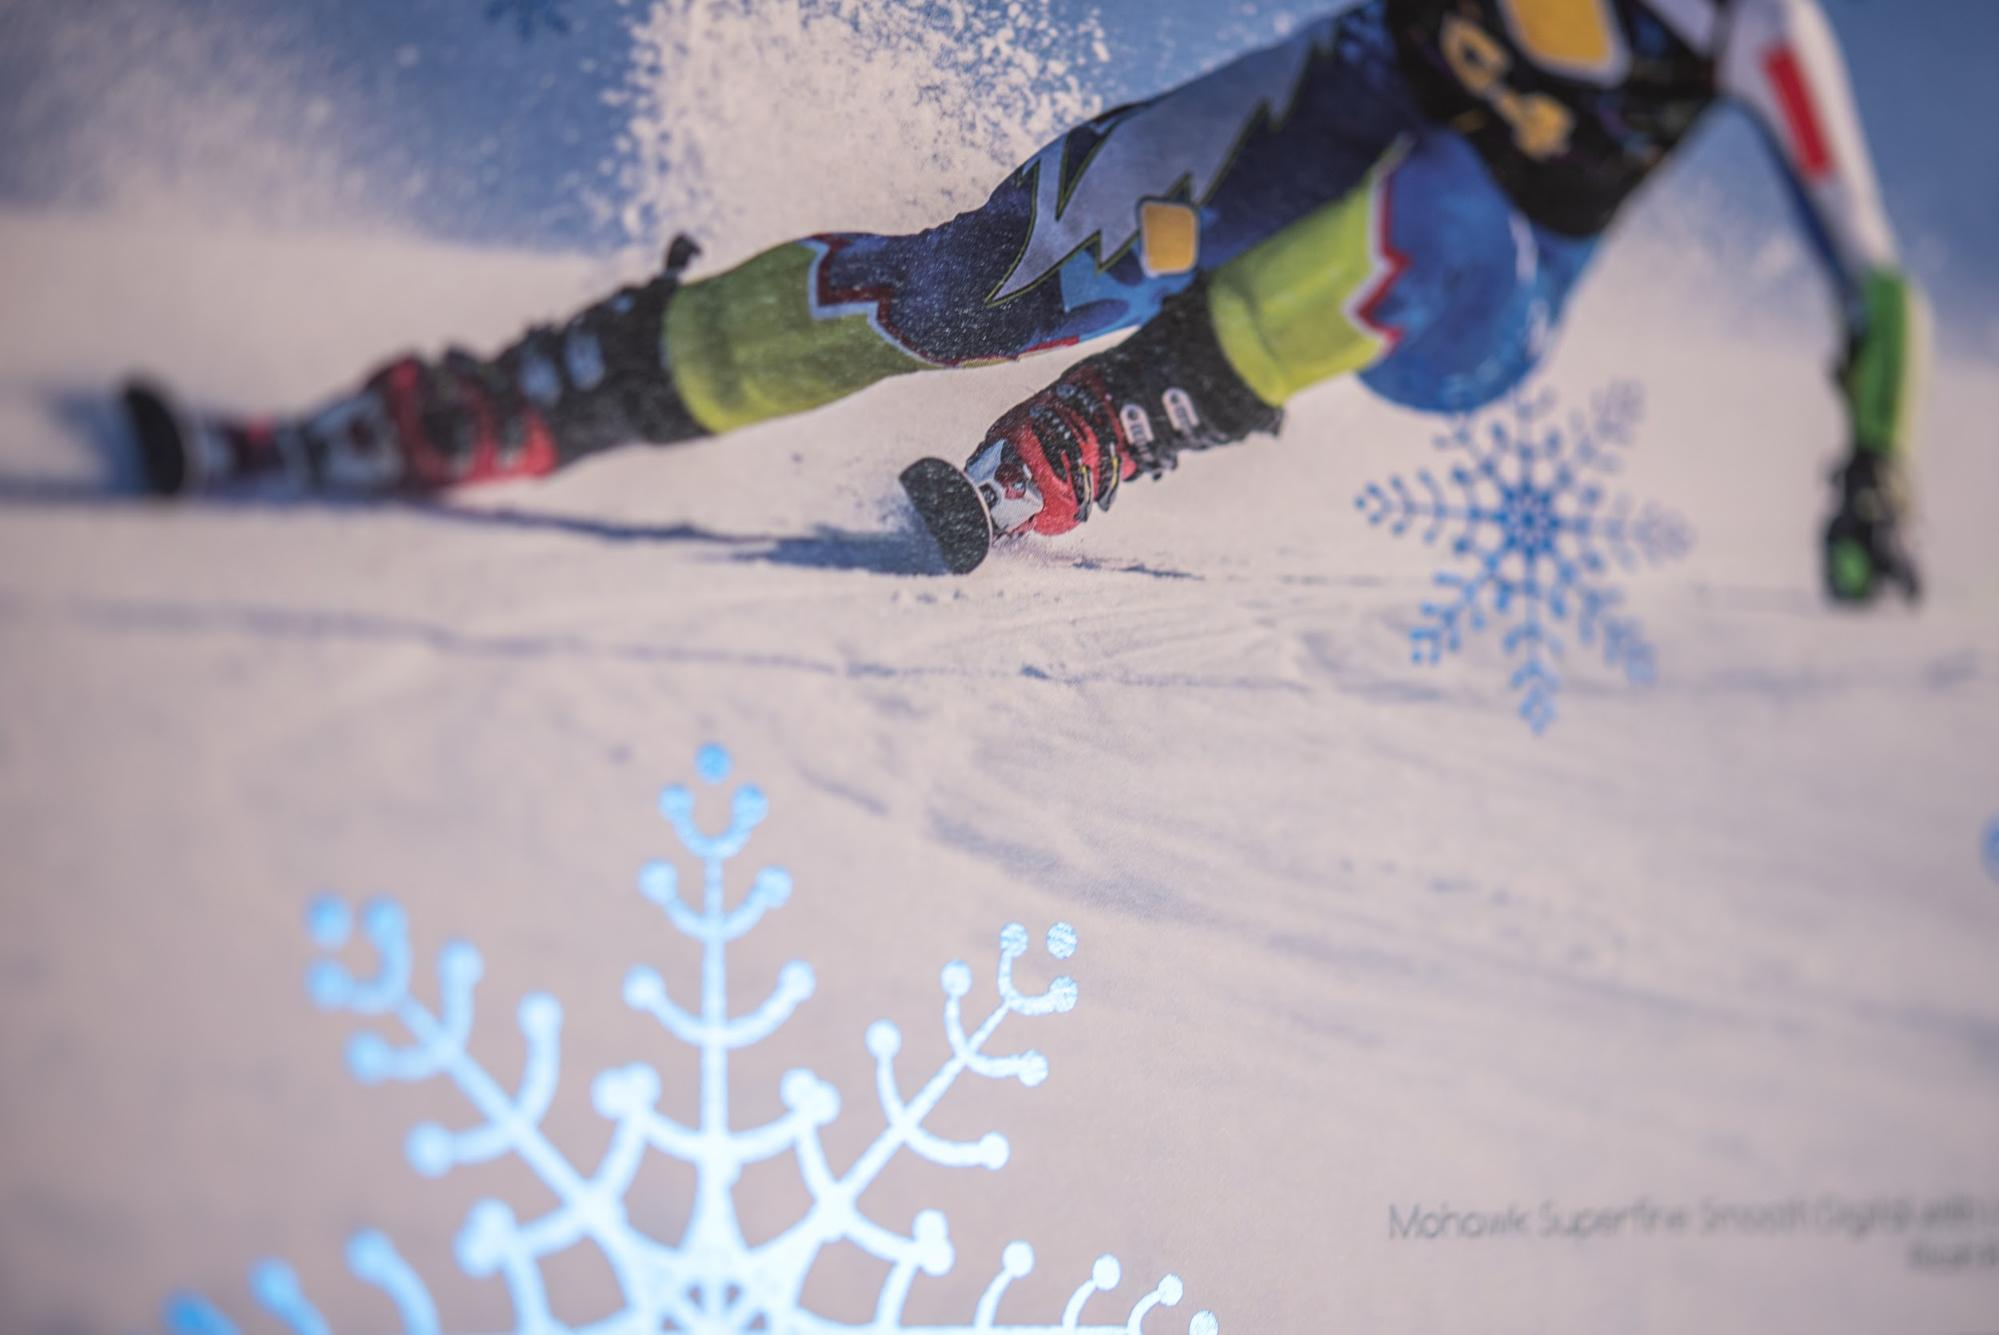 metallic ink print example of man skiing